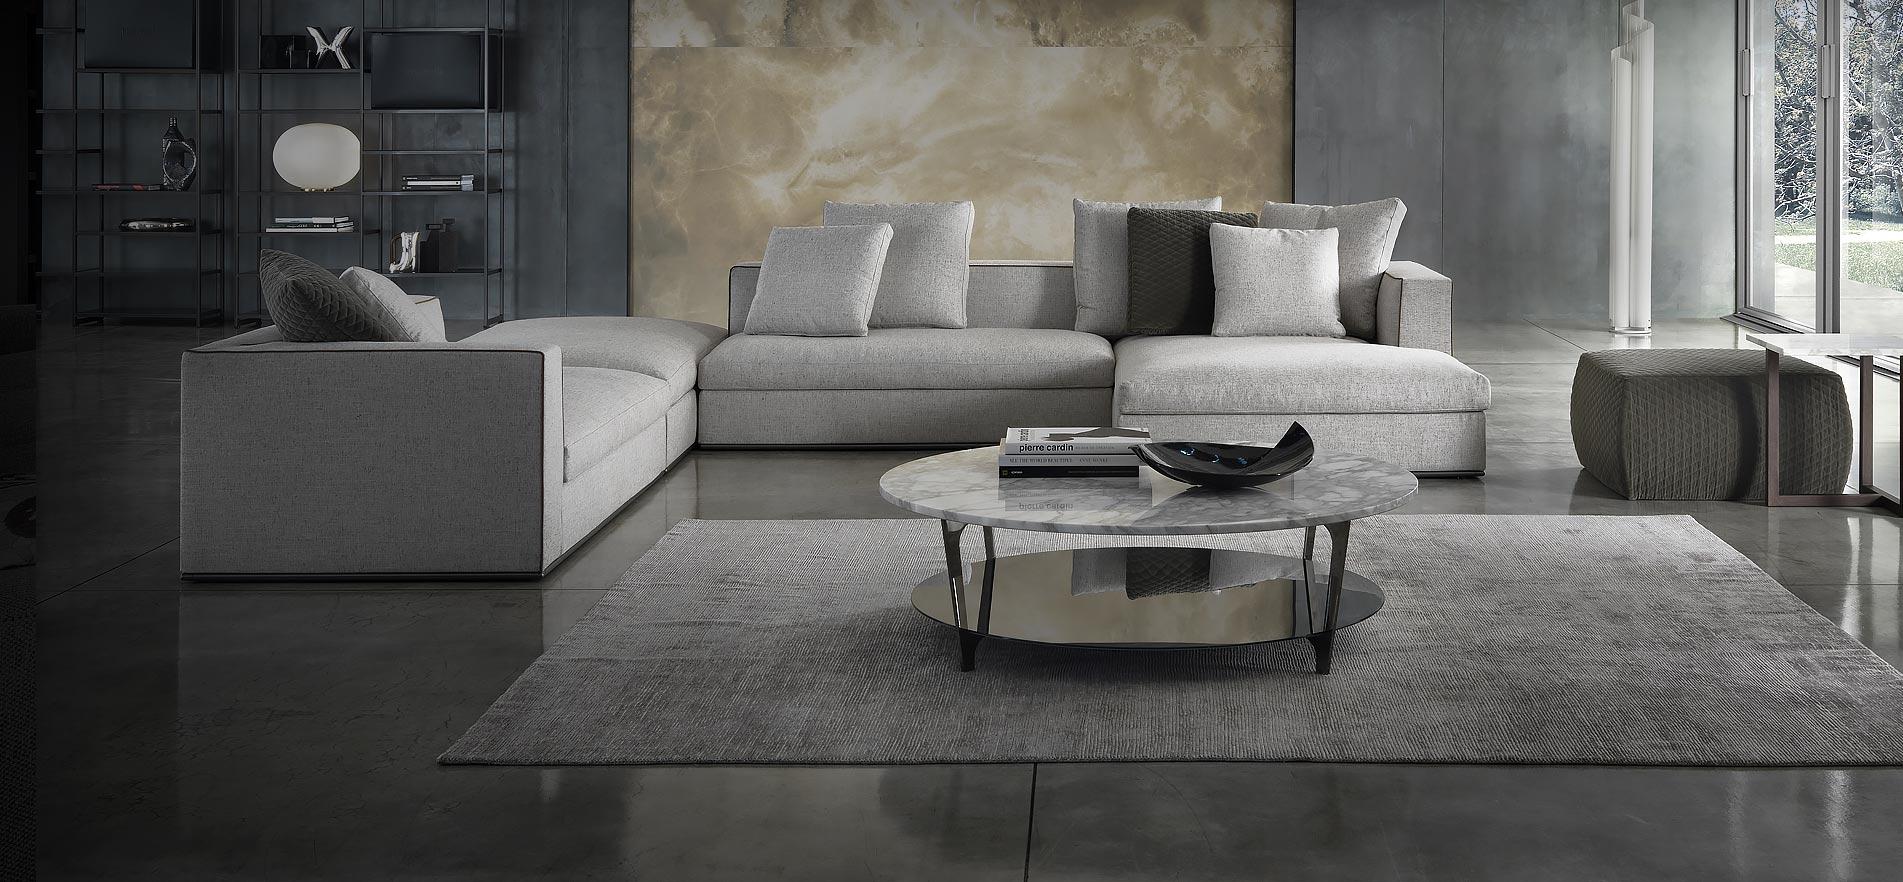 design couchtische aus glas oder holz. Black Bedroom Furniture Sets. Home Design Ideas